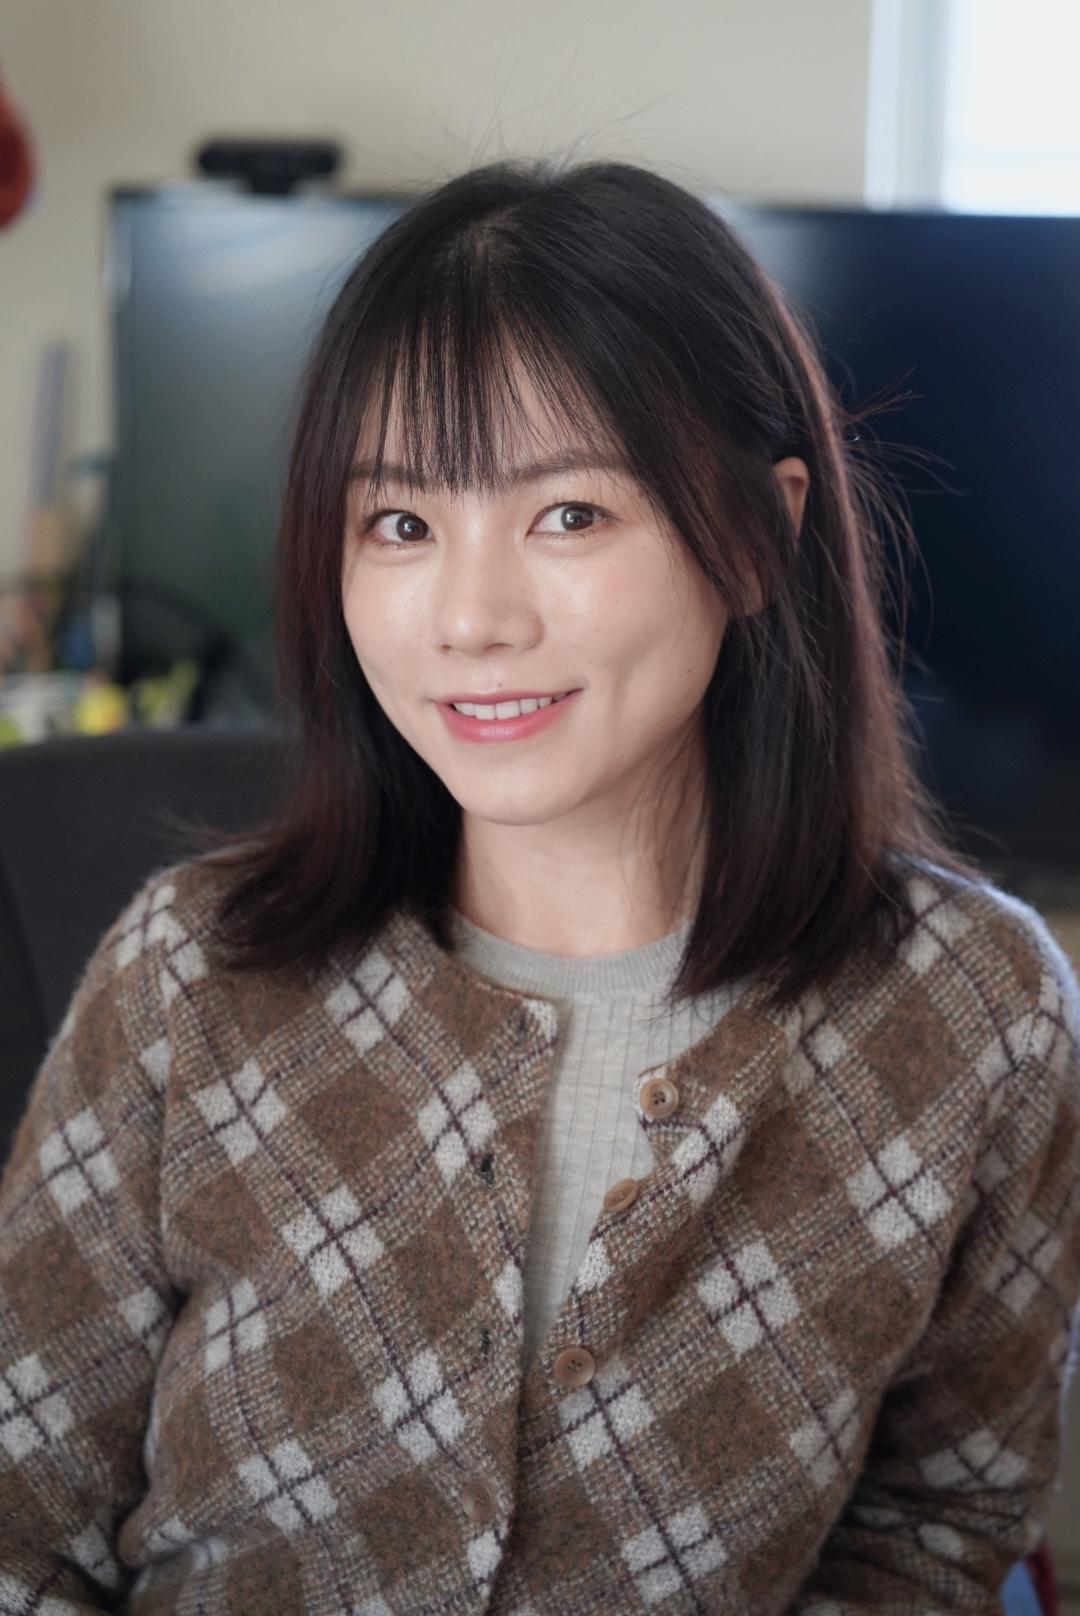 Chloe Qian